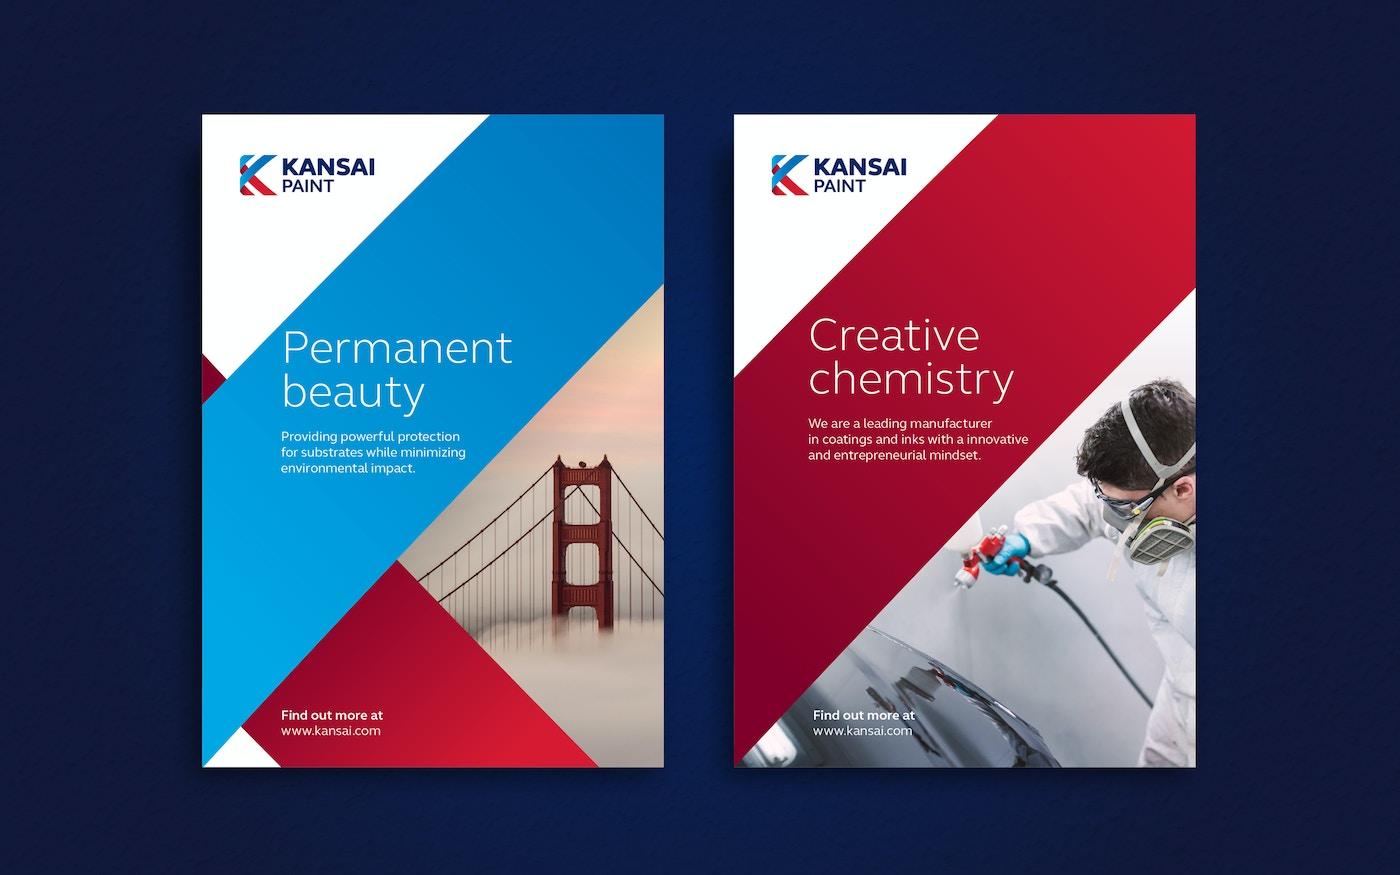 Kansai Paint new visual identity